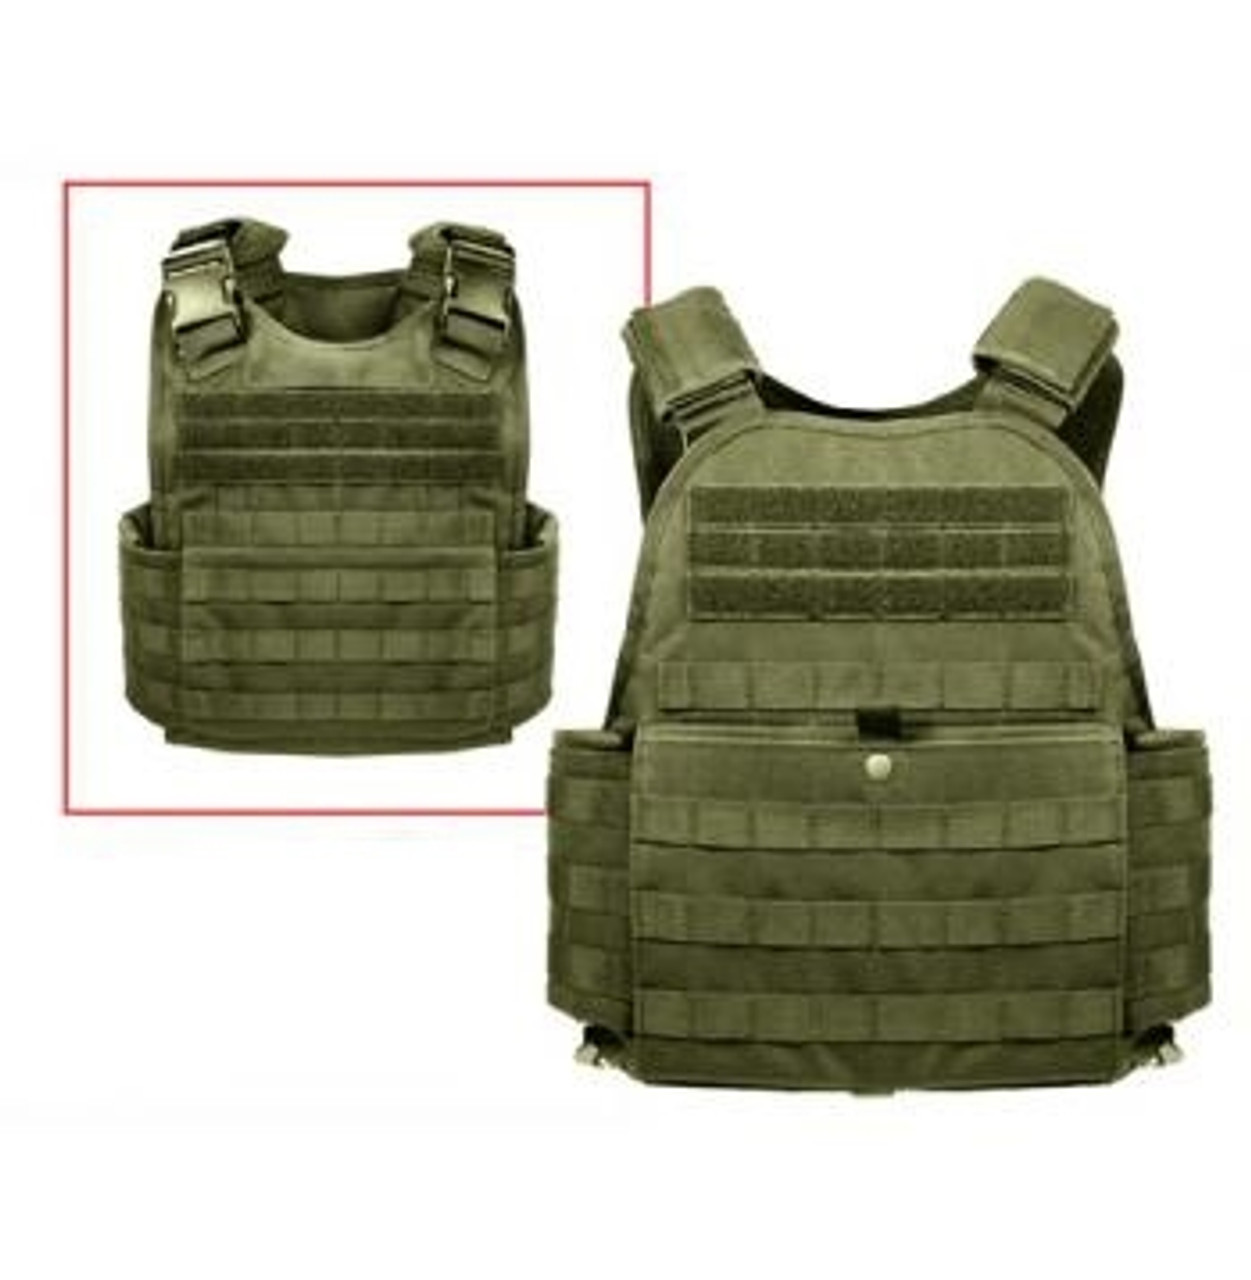 M.O.L.L.E. Plate Carrier Vest - OD